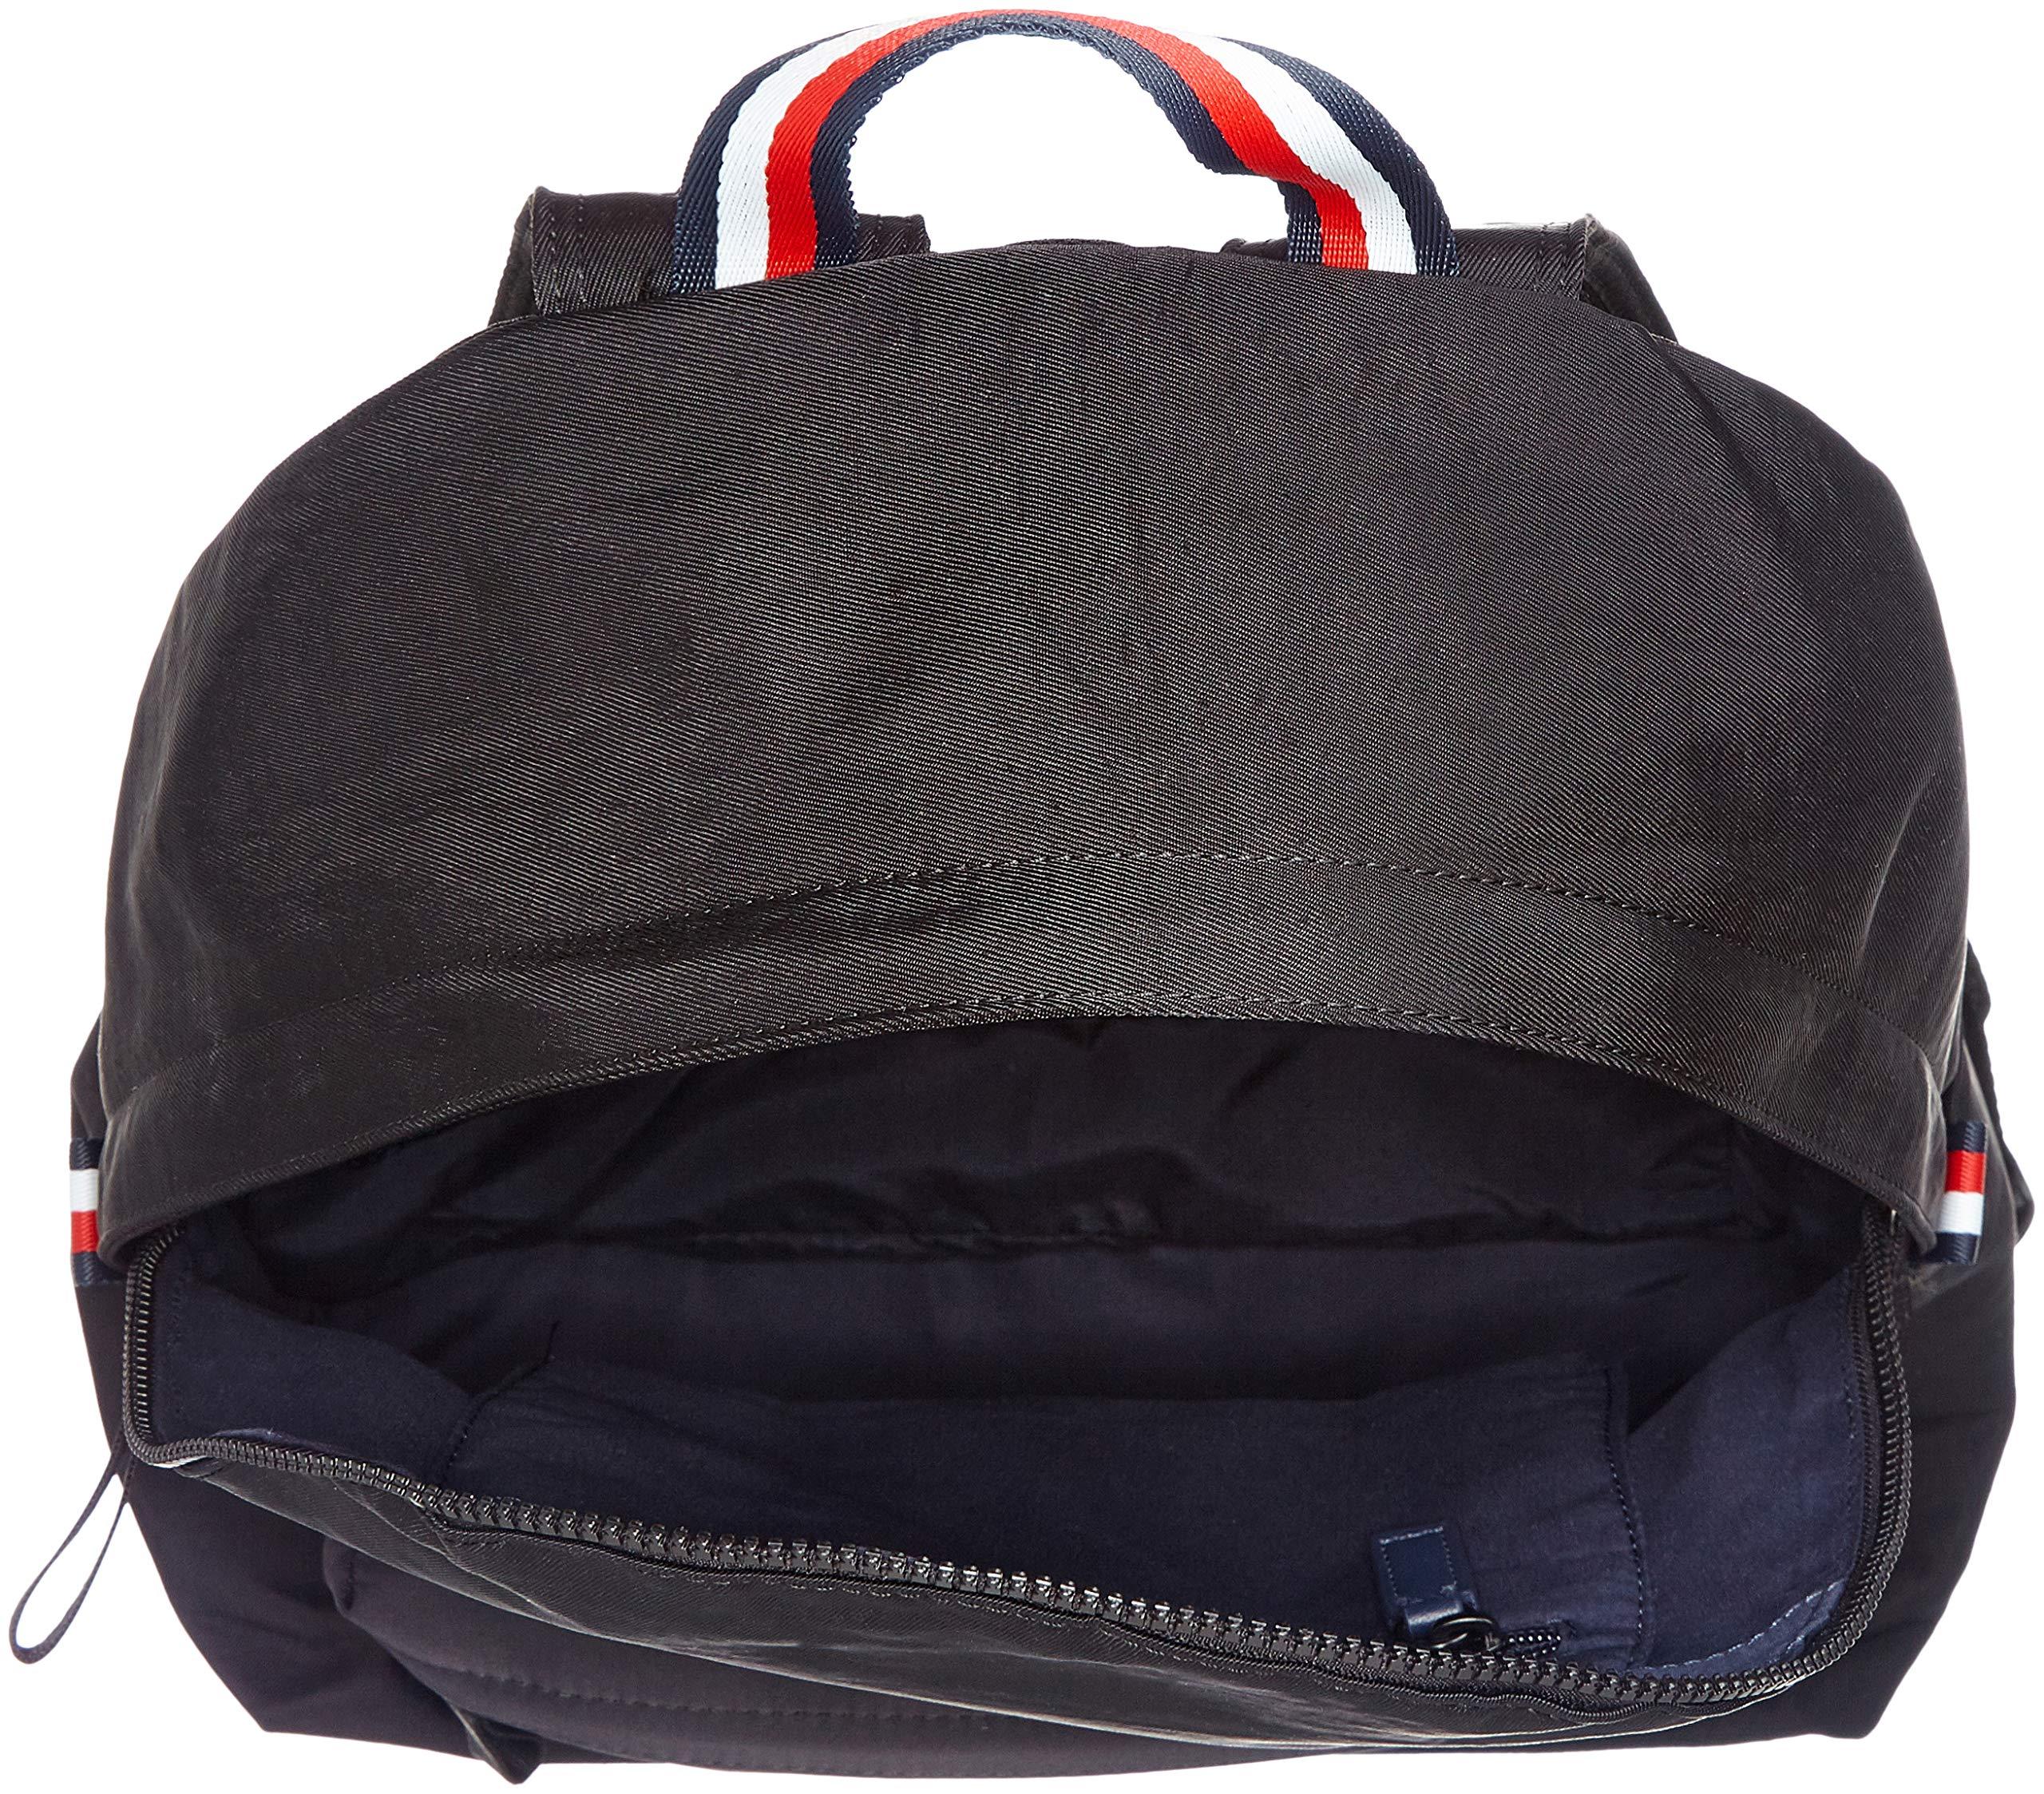 Tommy Hilfiger Utility Backpack Zaini Uomo, Nero (Black), 18x49x35 cm (B x H T)